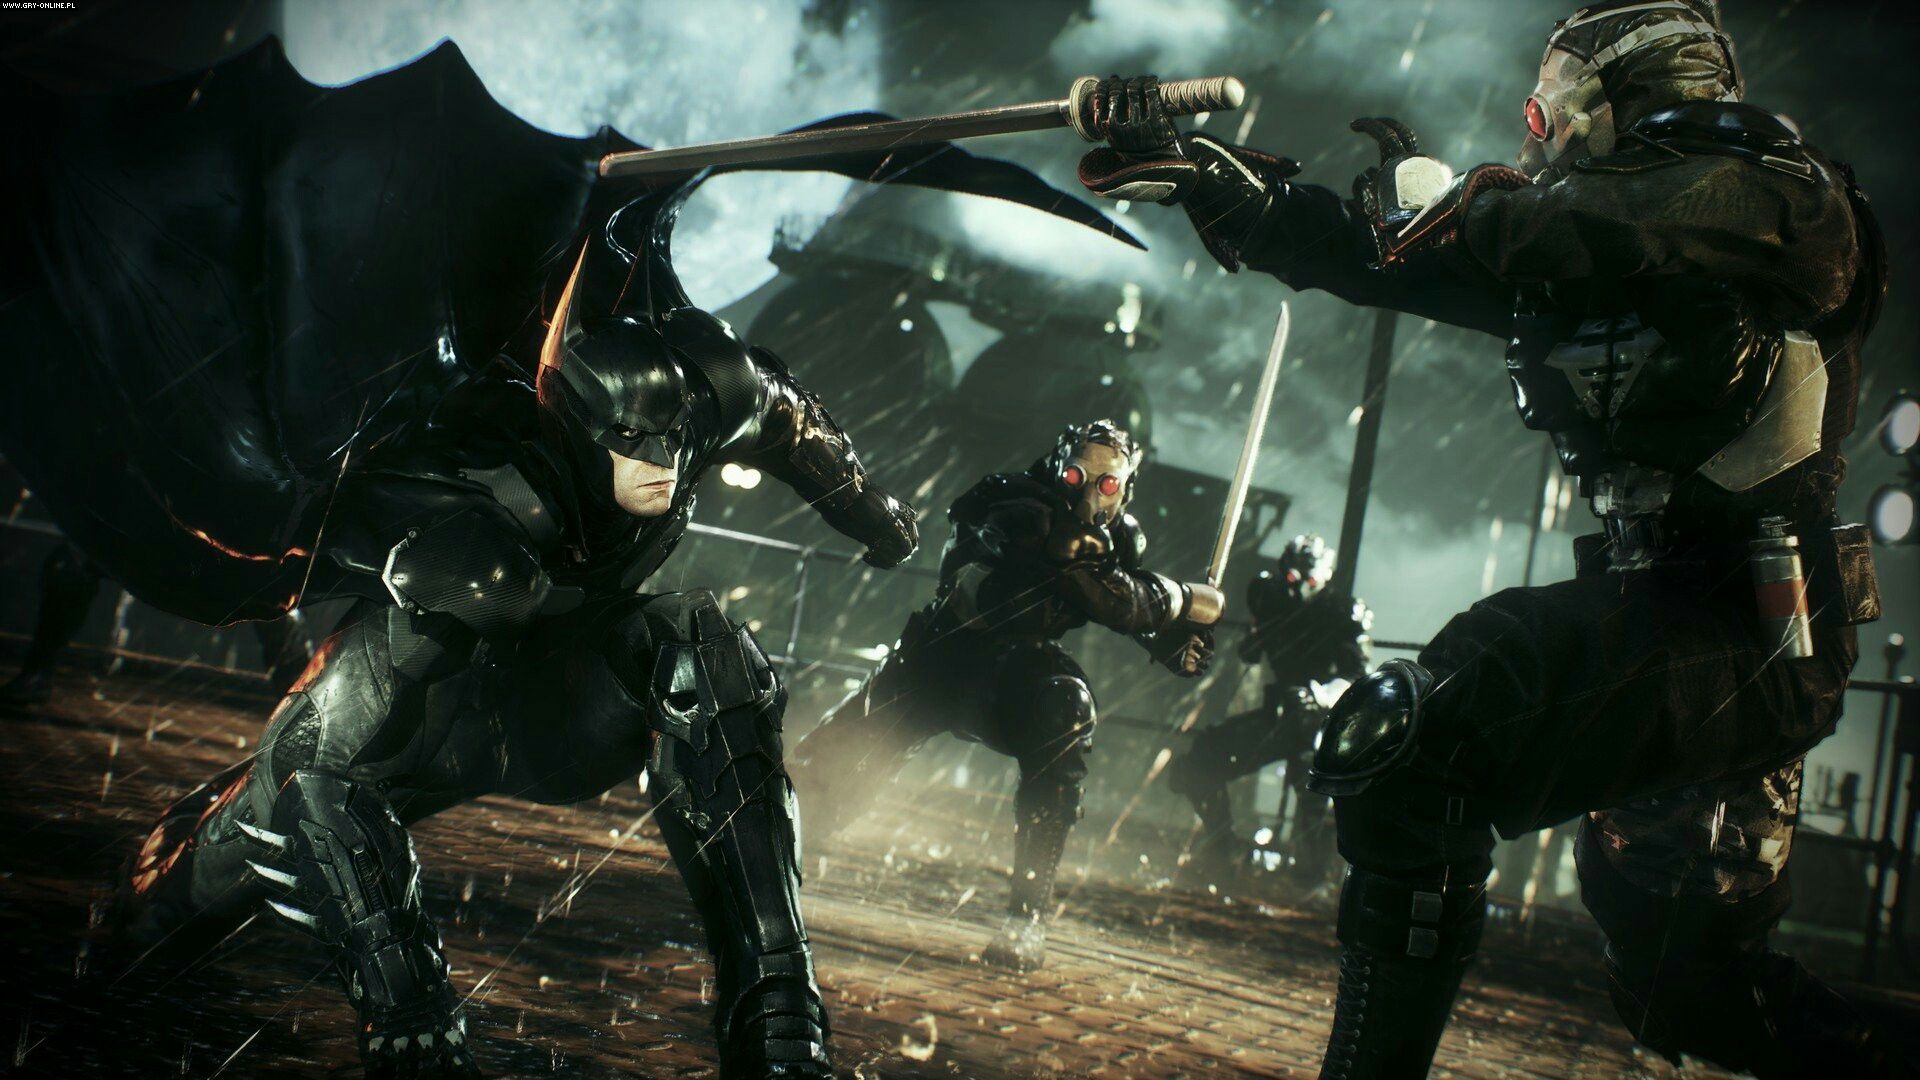 ocean of games batman arkham knight